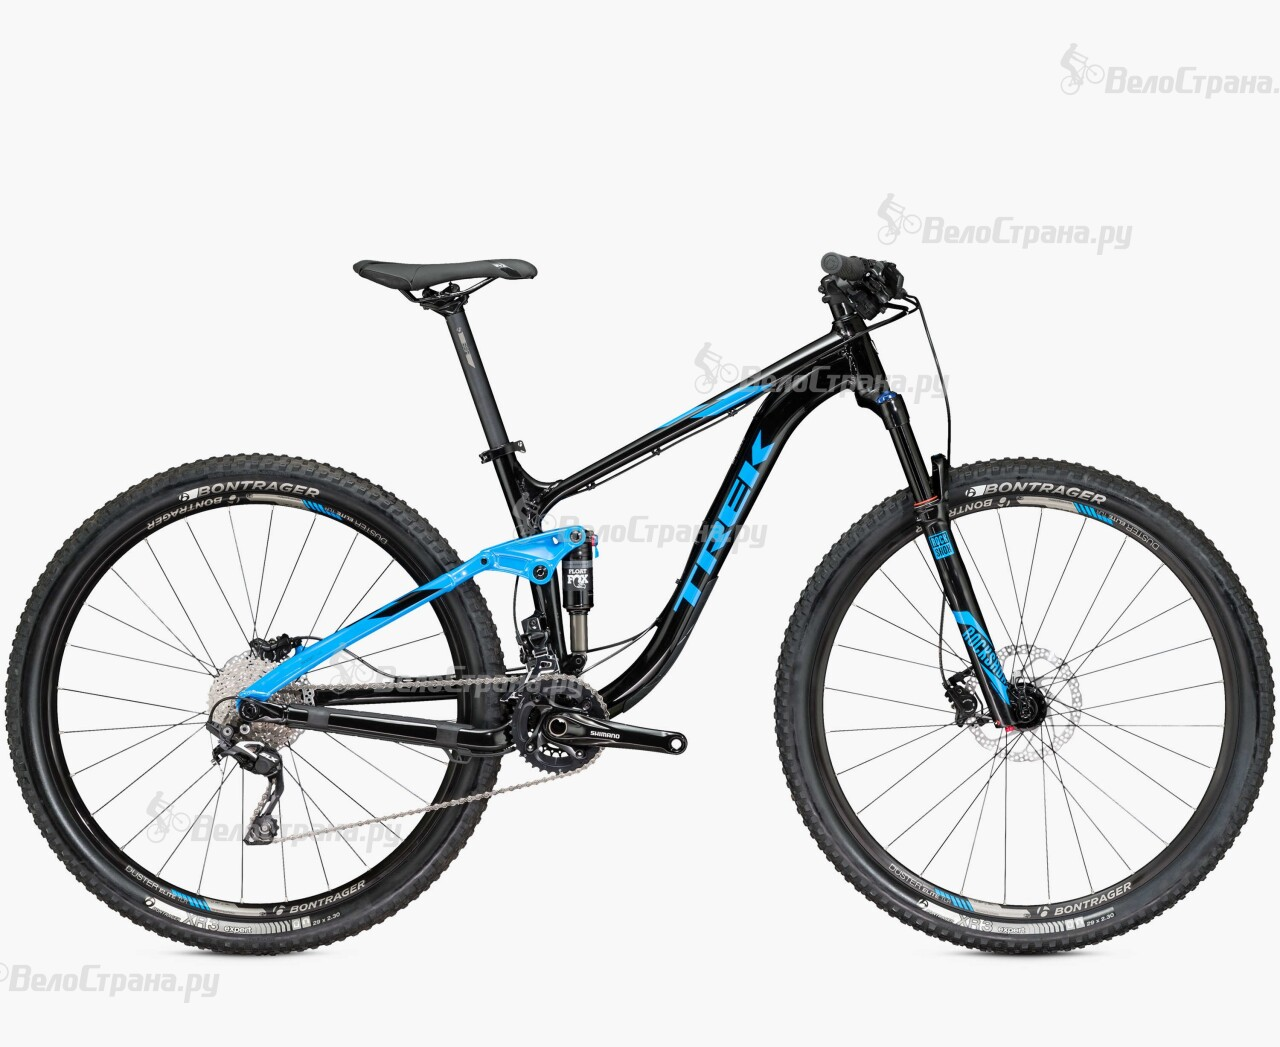 Велосипед Trek Fuel EX 7 29 (2016)